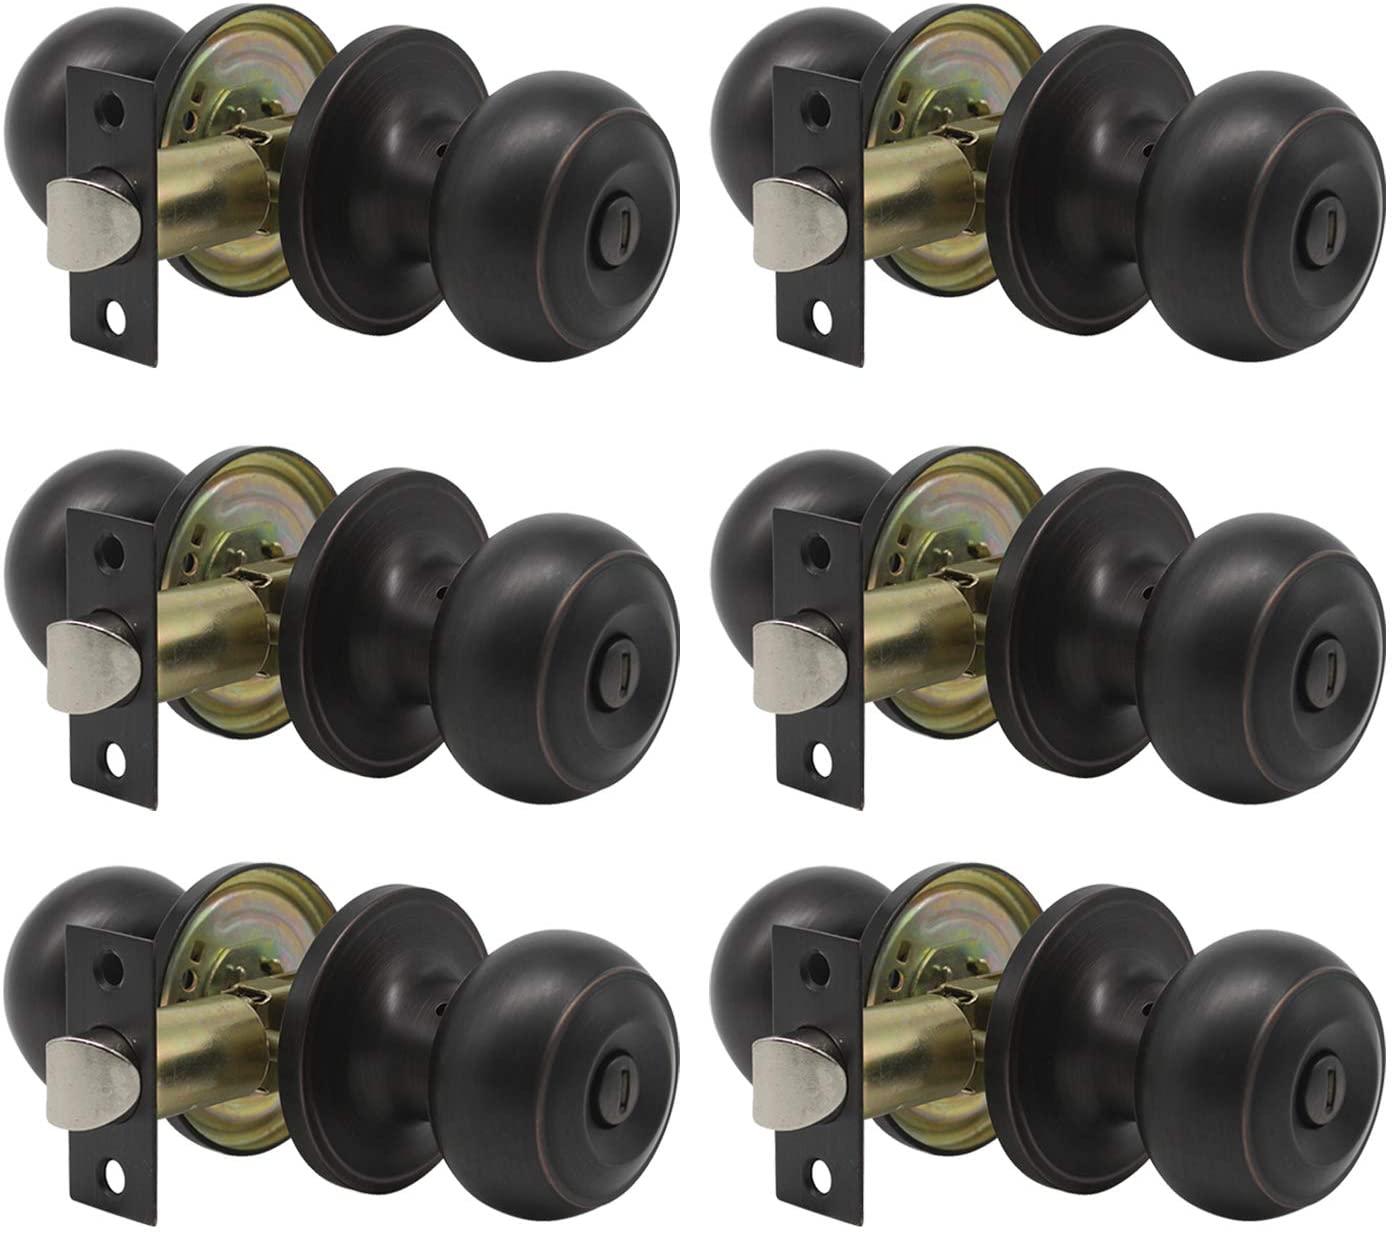 Gobrico 6 Pack Keyless Privacy Handles Flat Ball Door Knobs in Oil Rubbed Bronze Interior Door Locksets for Bed/Bathroom